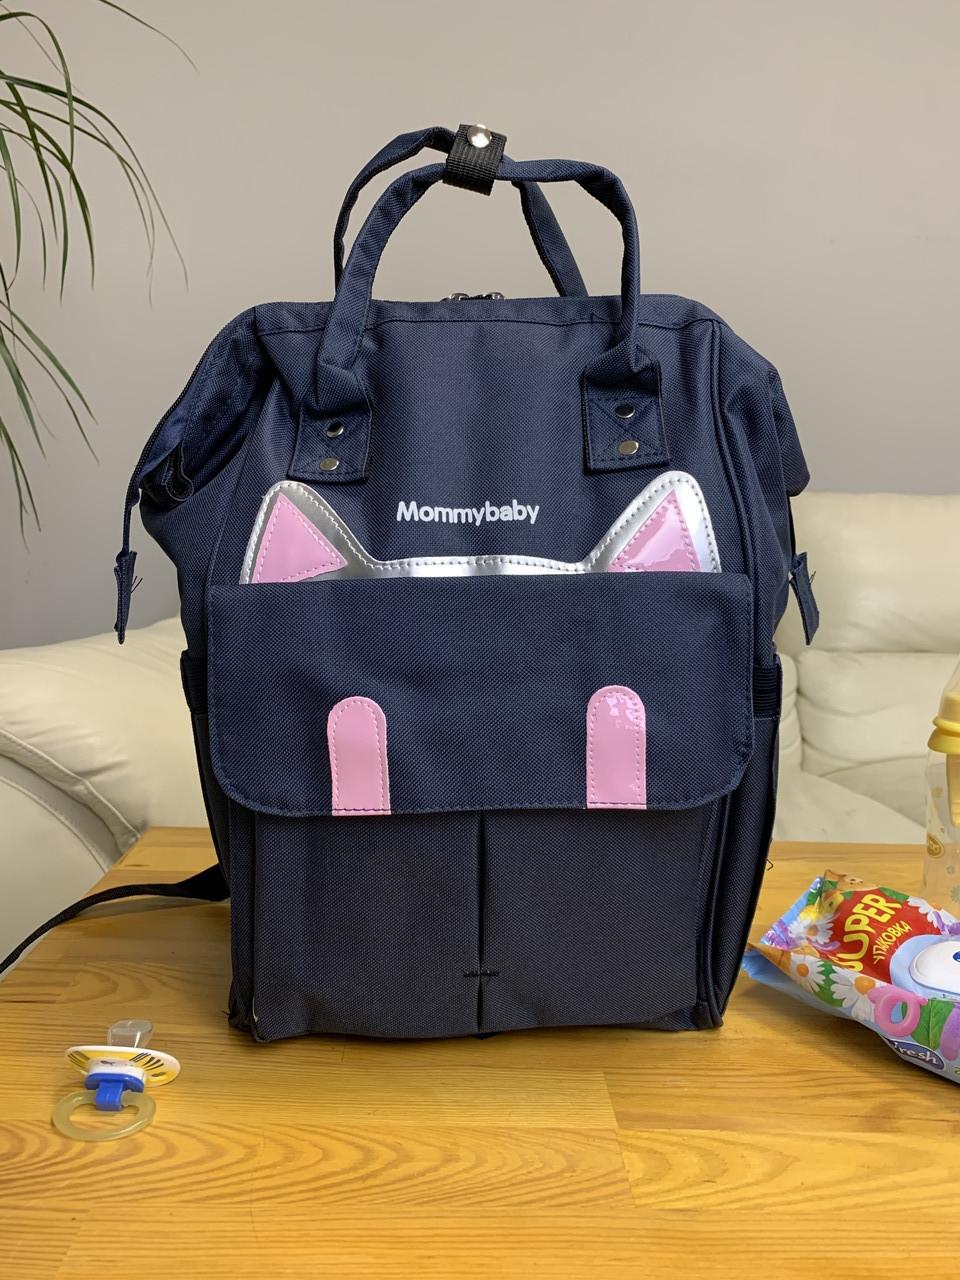 Сумка - рюкзак для мам Mommybaby/Мами бэйби  ->  синий цвет